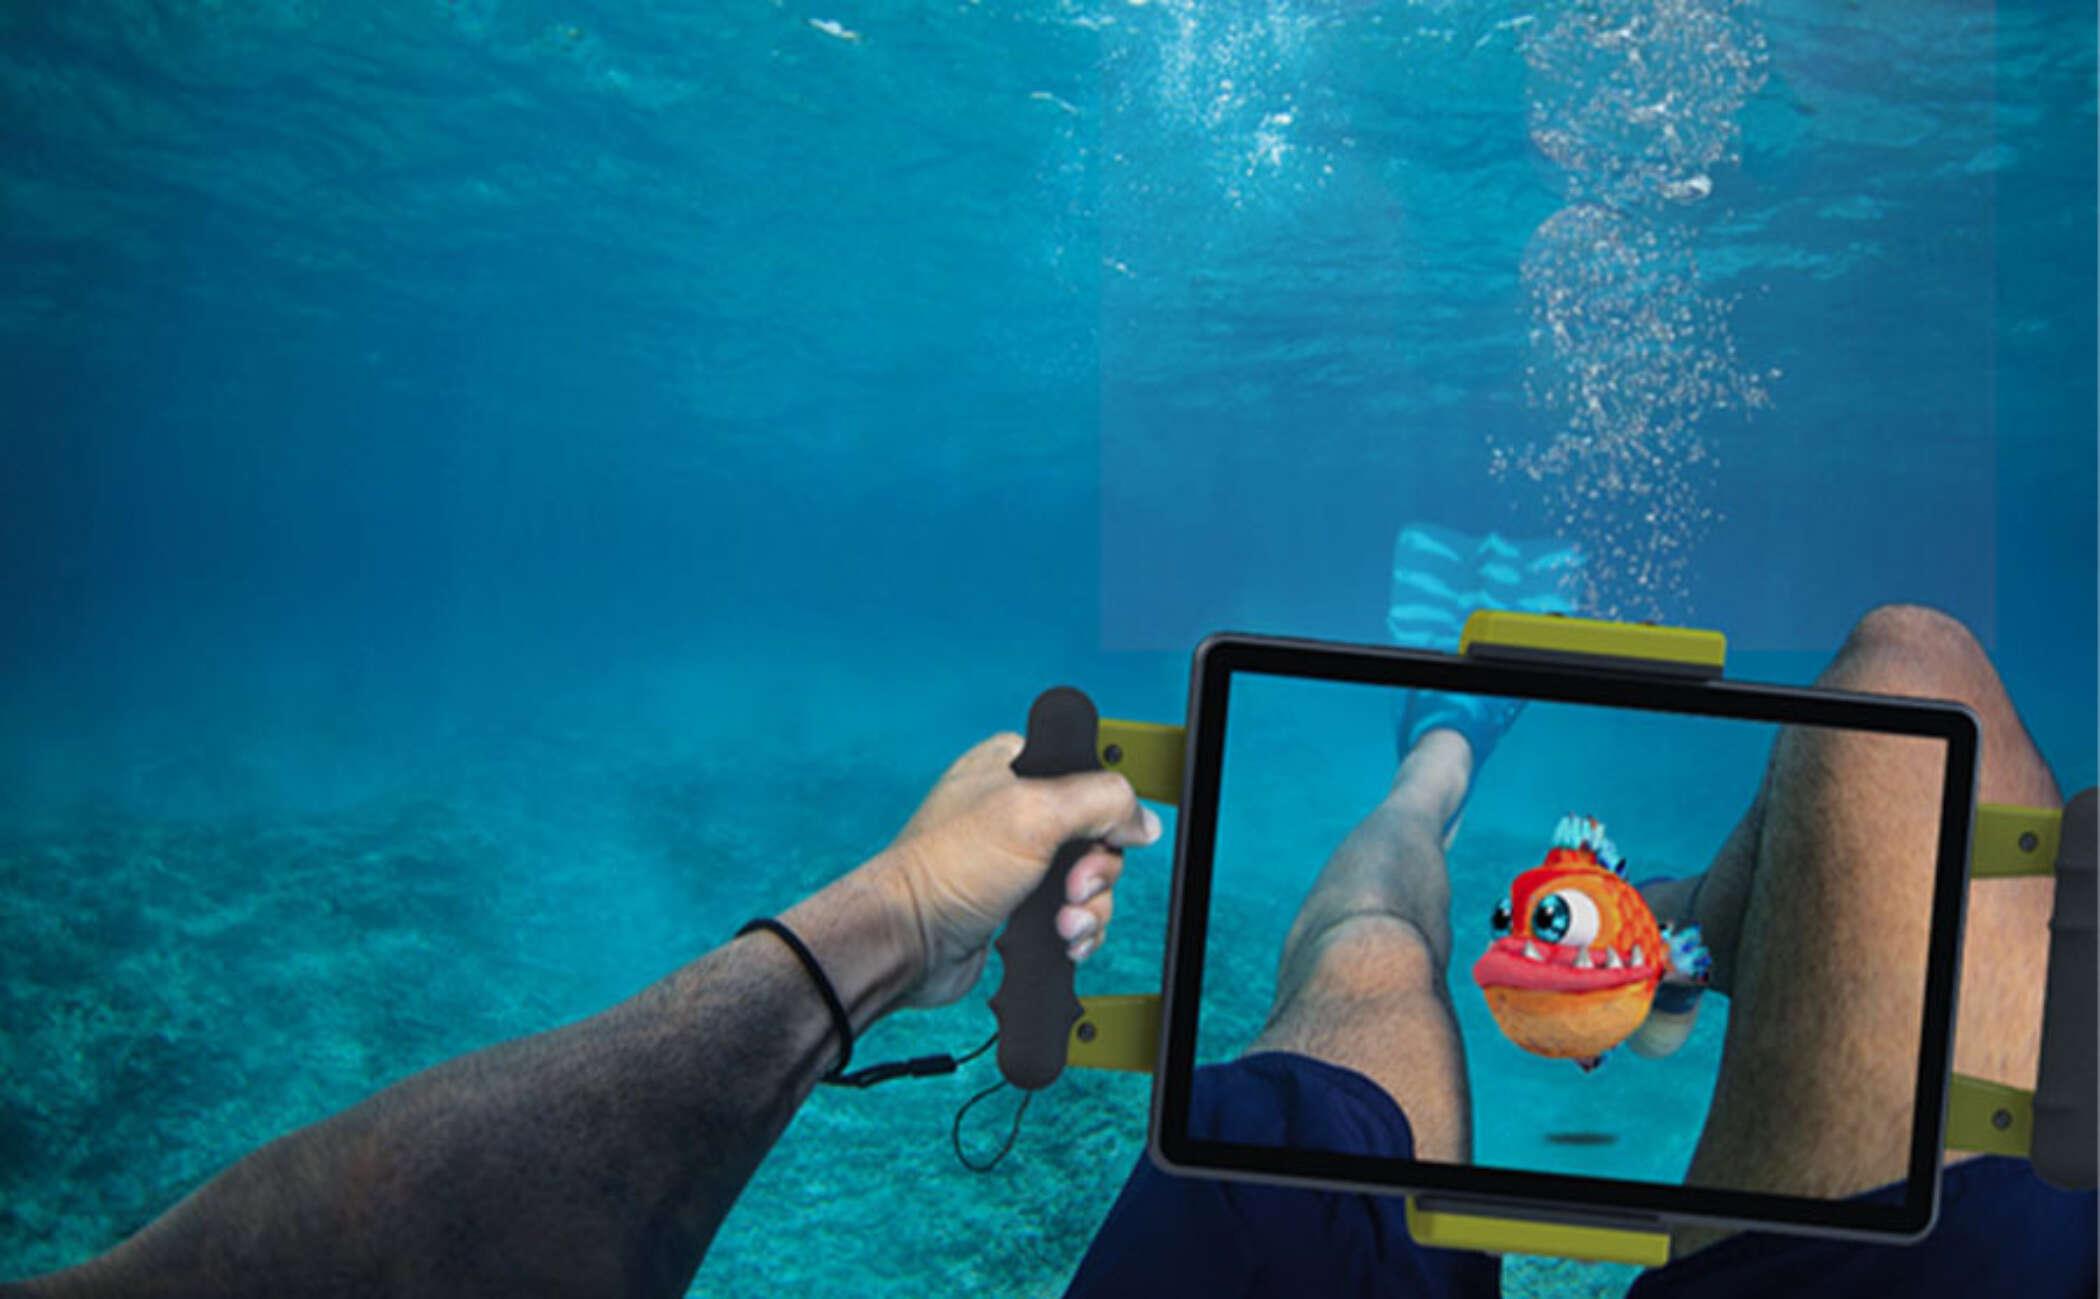 Untitled 1 0004 Pool AR Experience